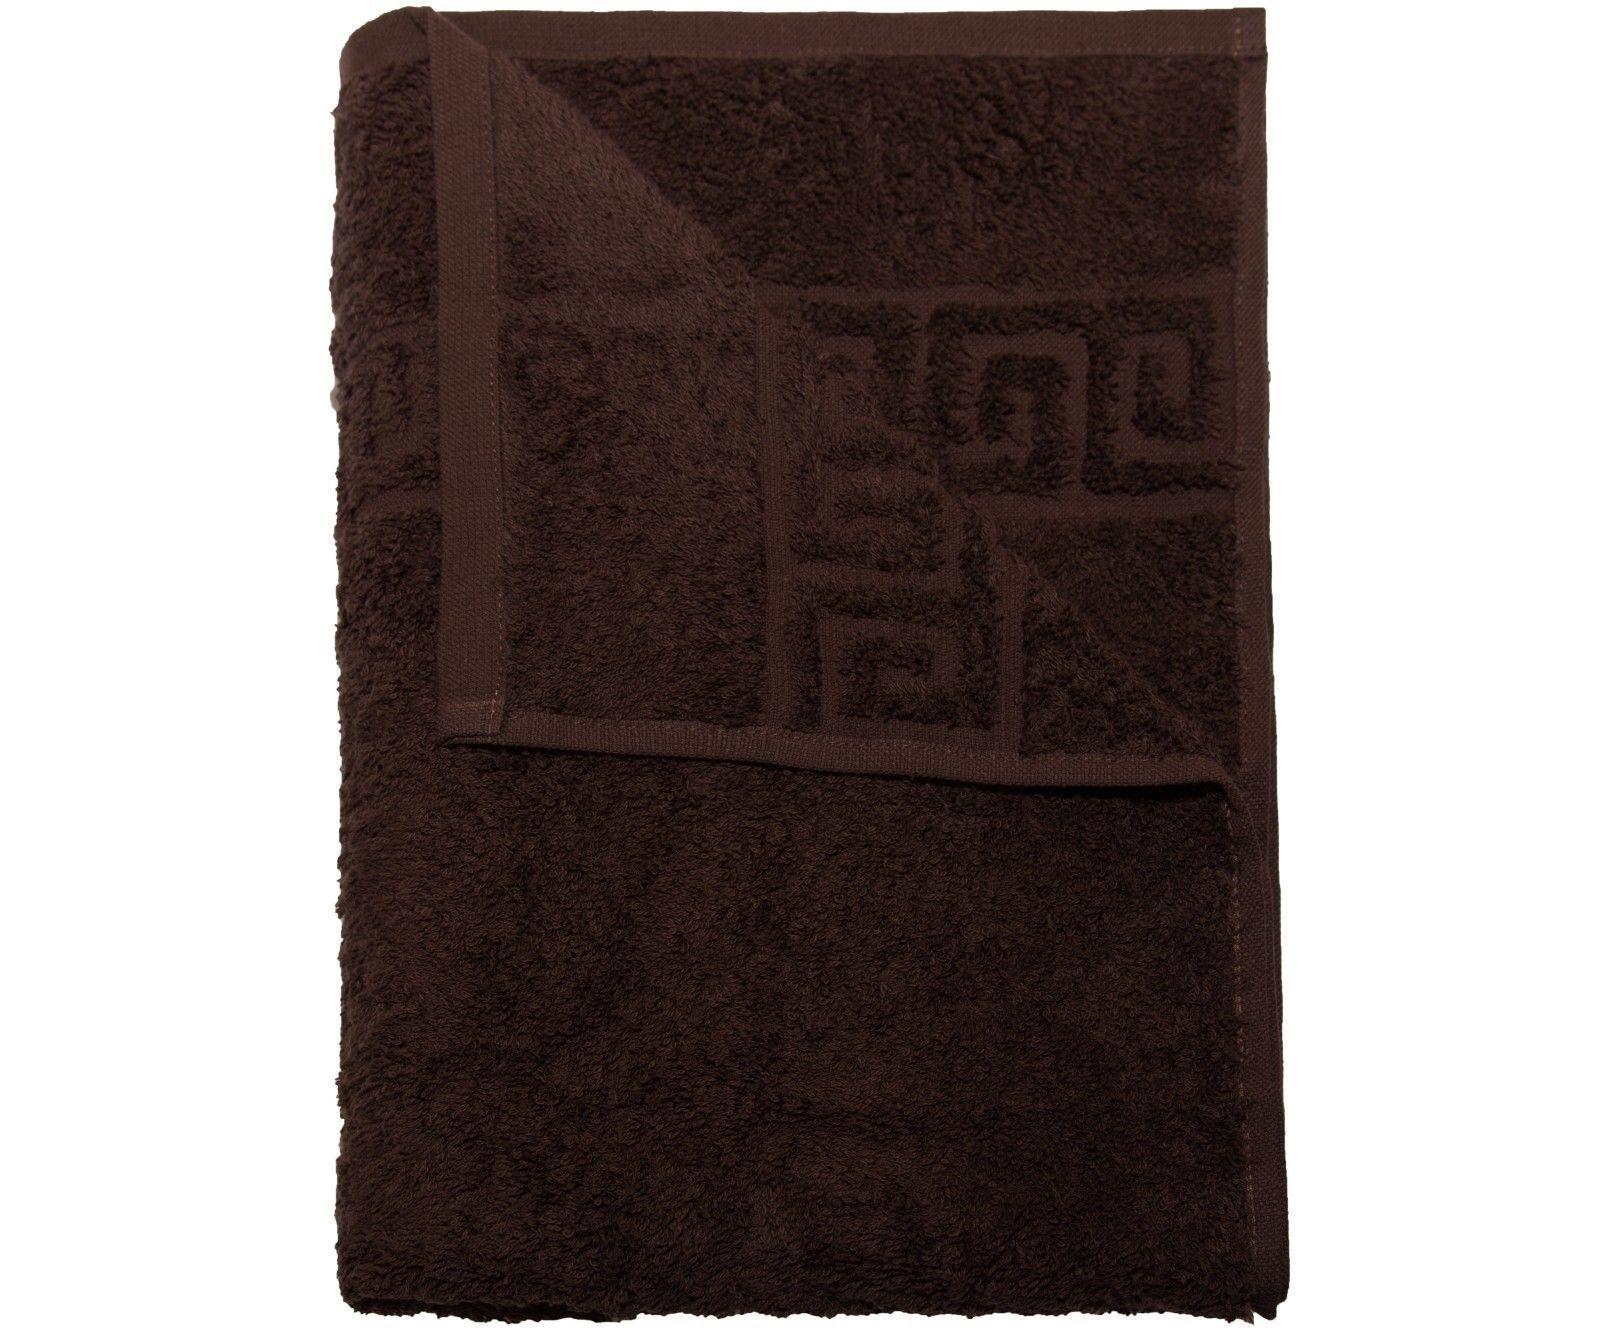 Bath Towels set 2 Bath and 2 Hand Or 2 Bath, 2 Hand Towels Gym Spa 110% Cotton